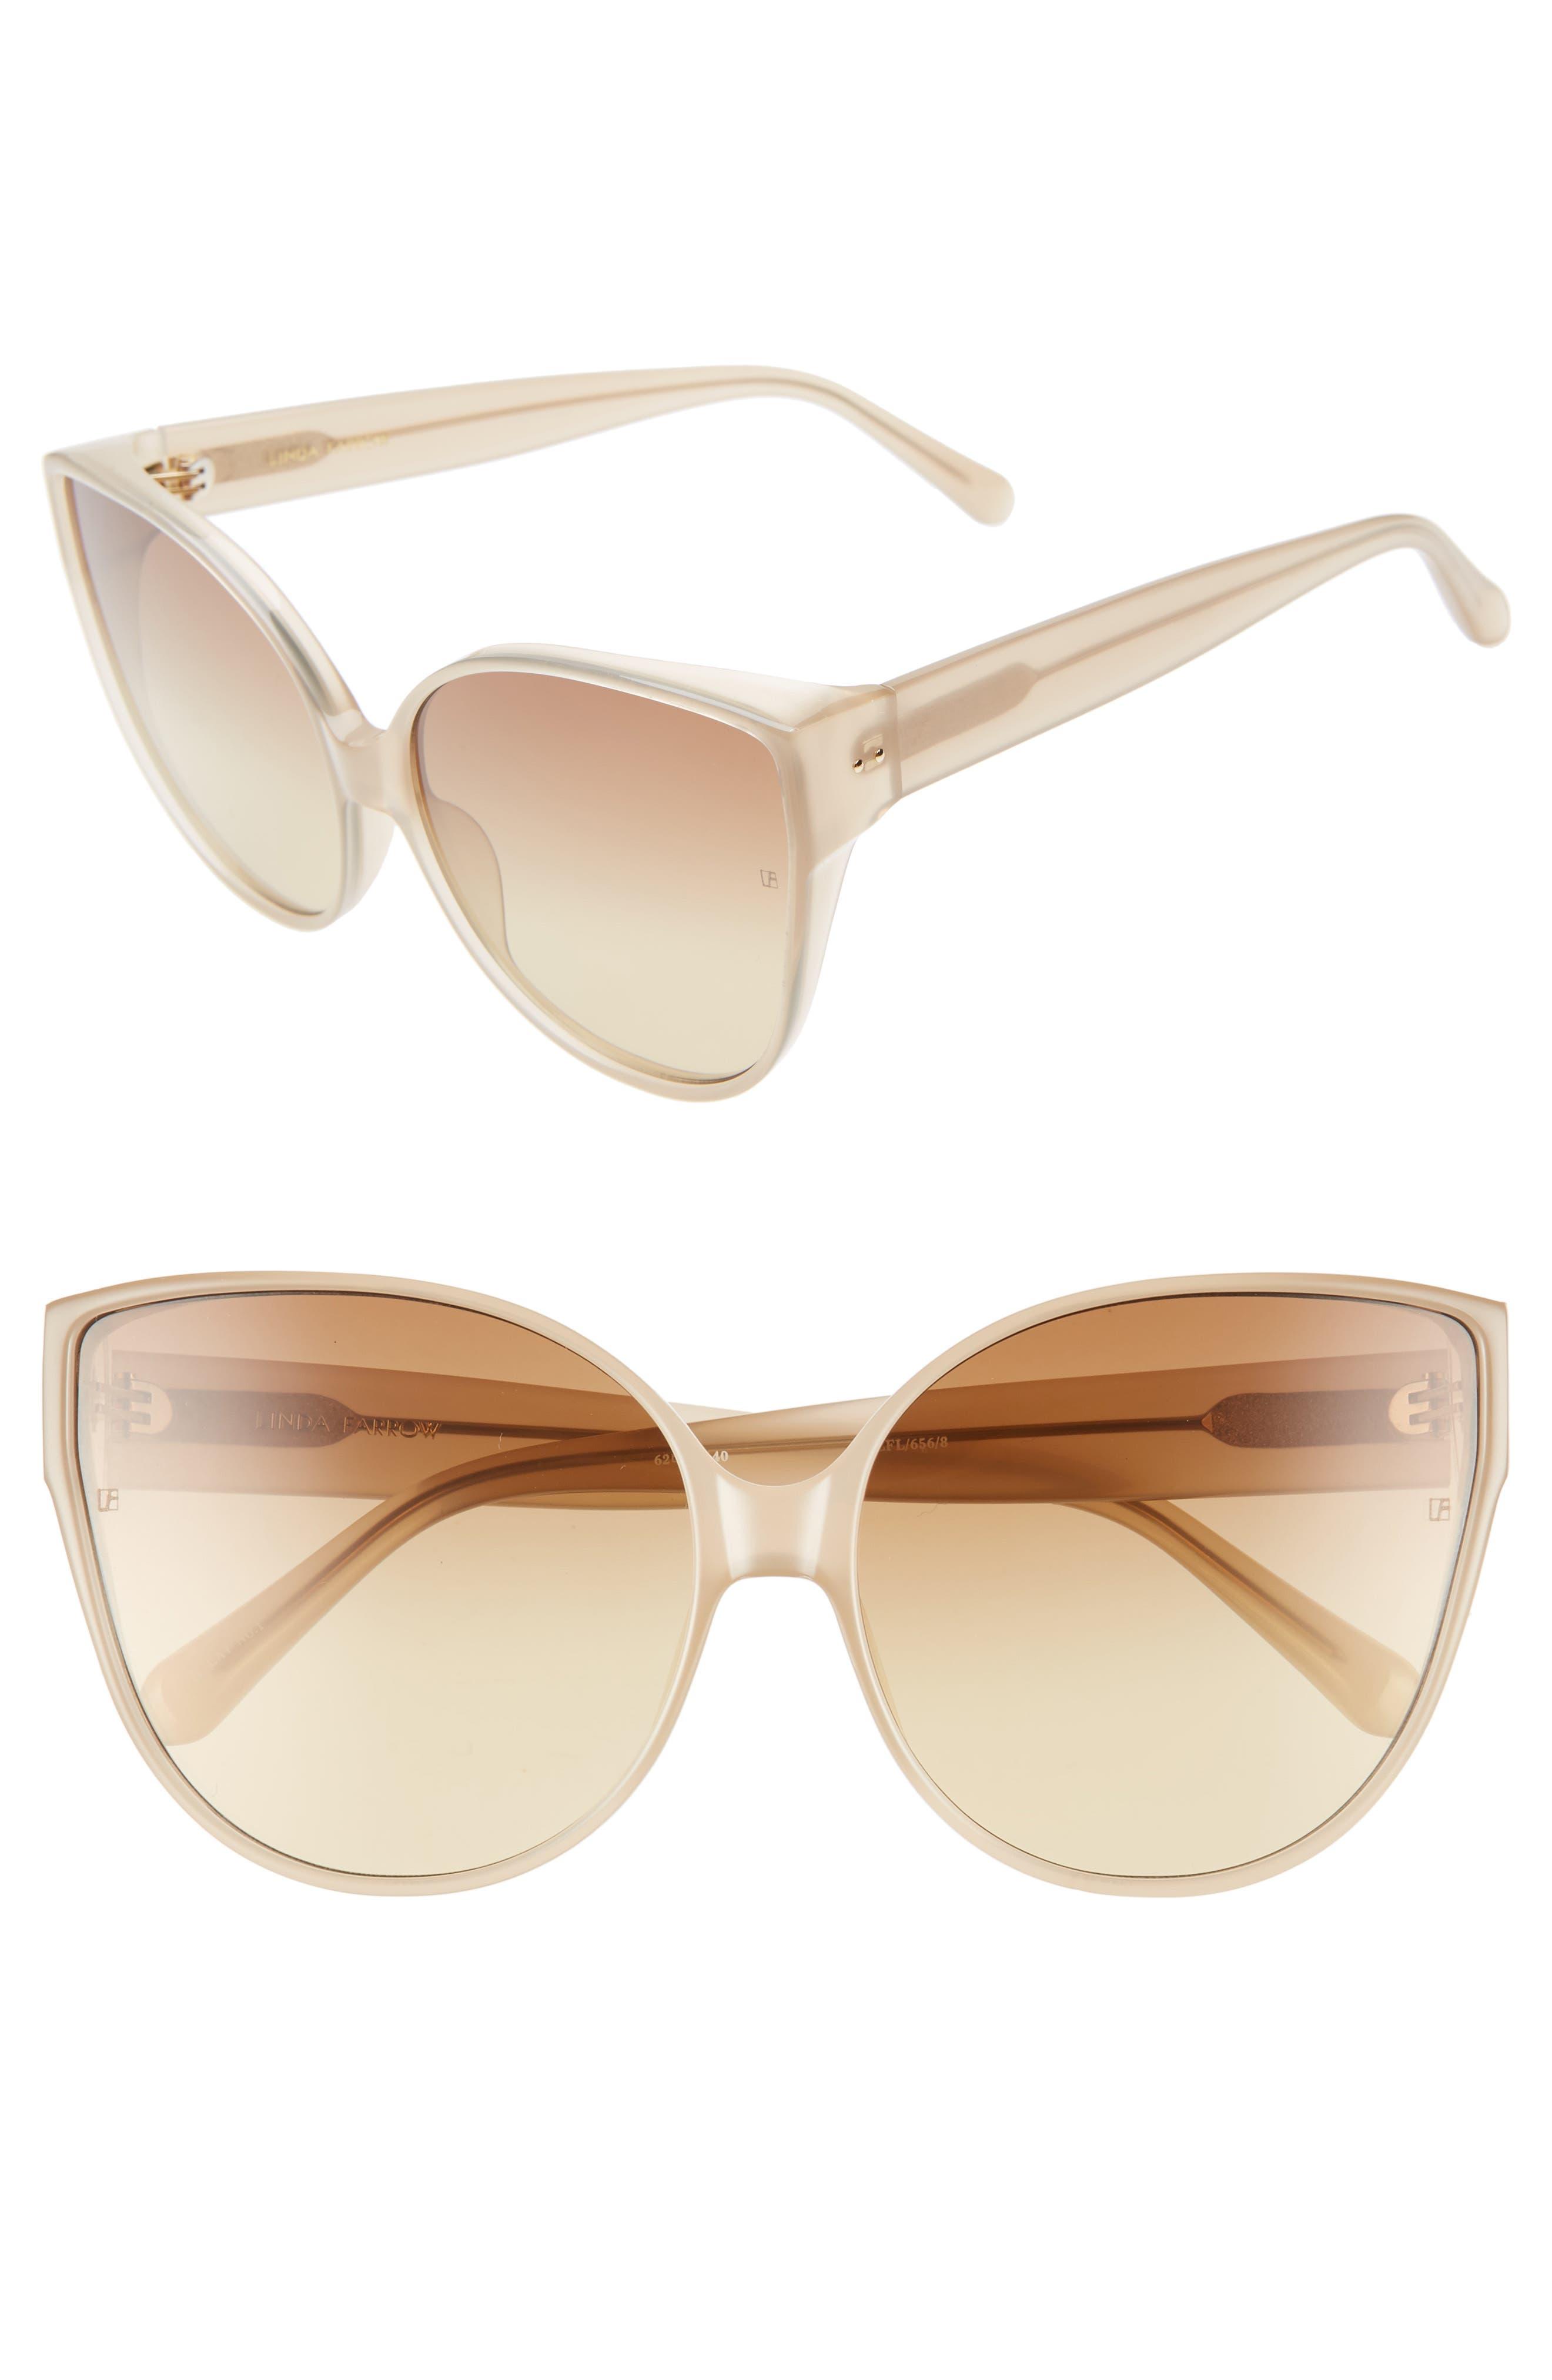 62mm Oversize Cat Eye Sunglasses,                         Main,                         color, MILKY TOBACCO